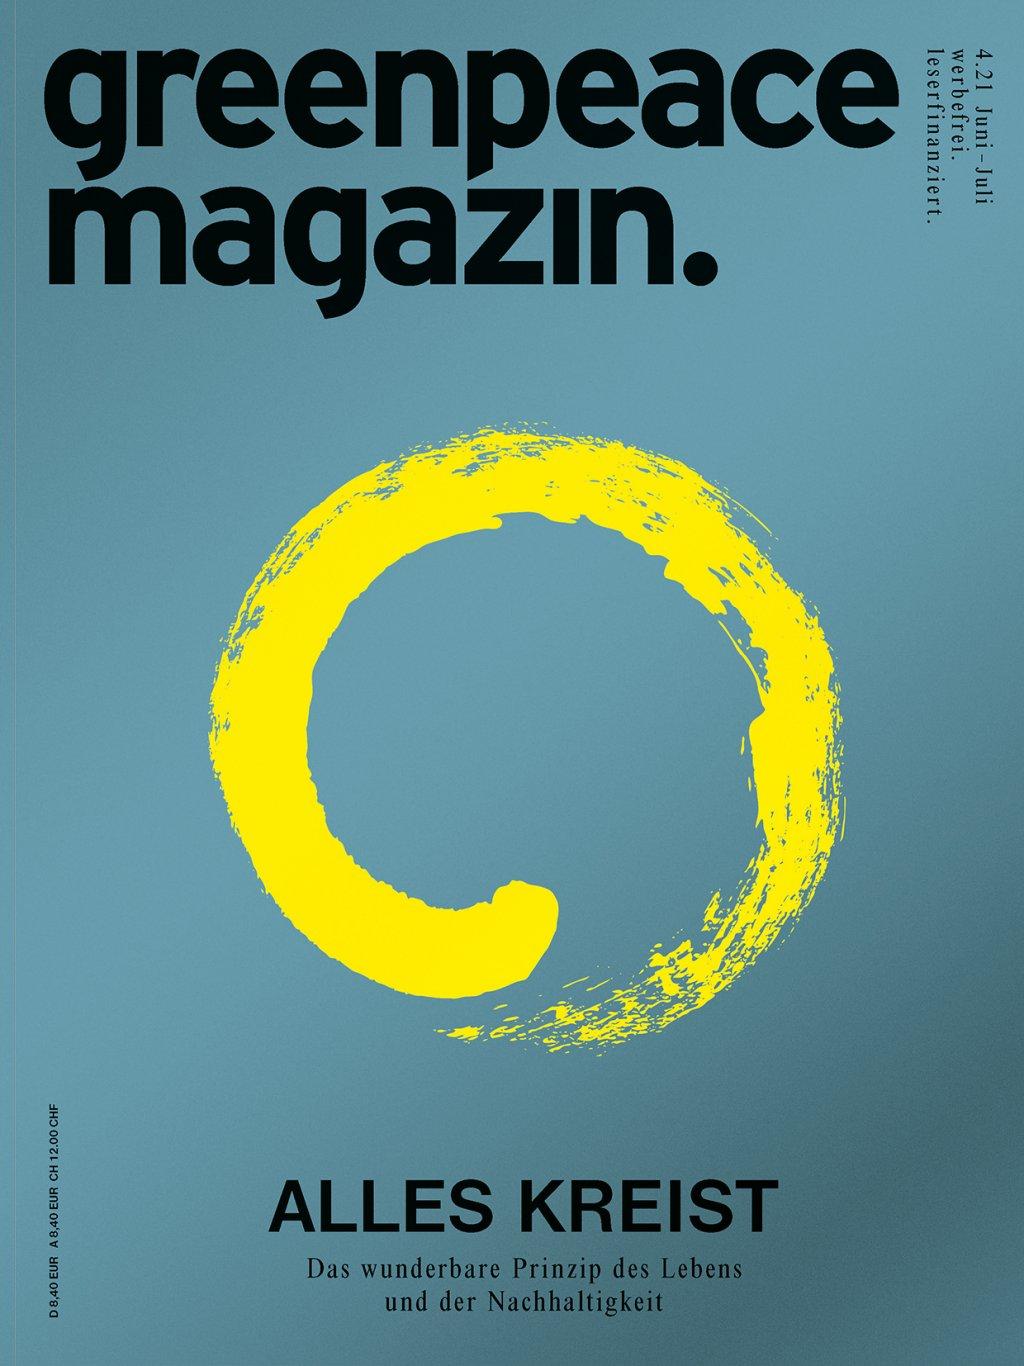 Greenpeace Magazin | Aboshop